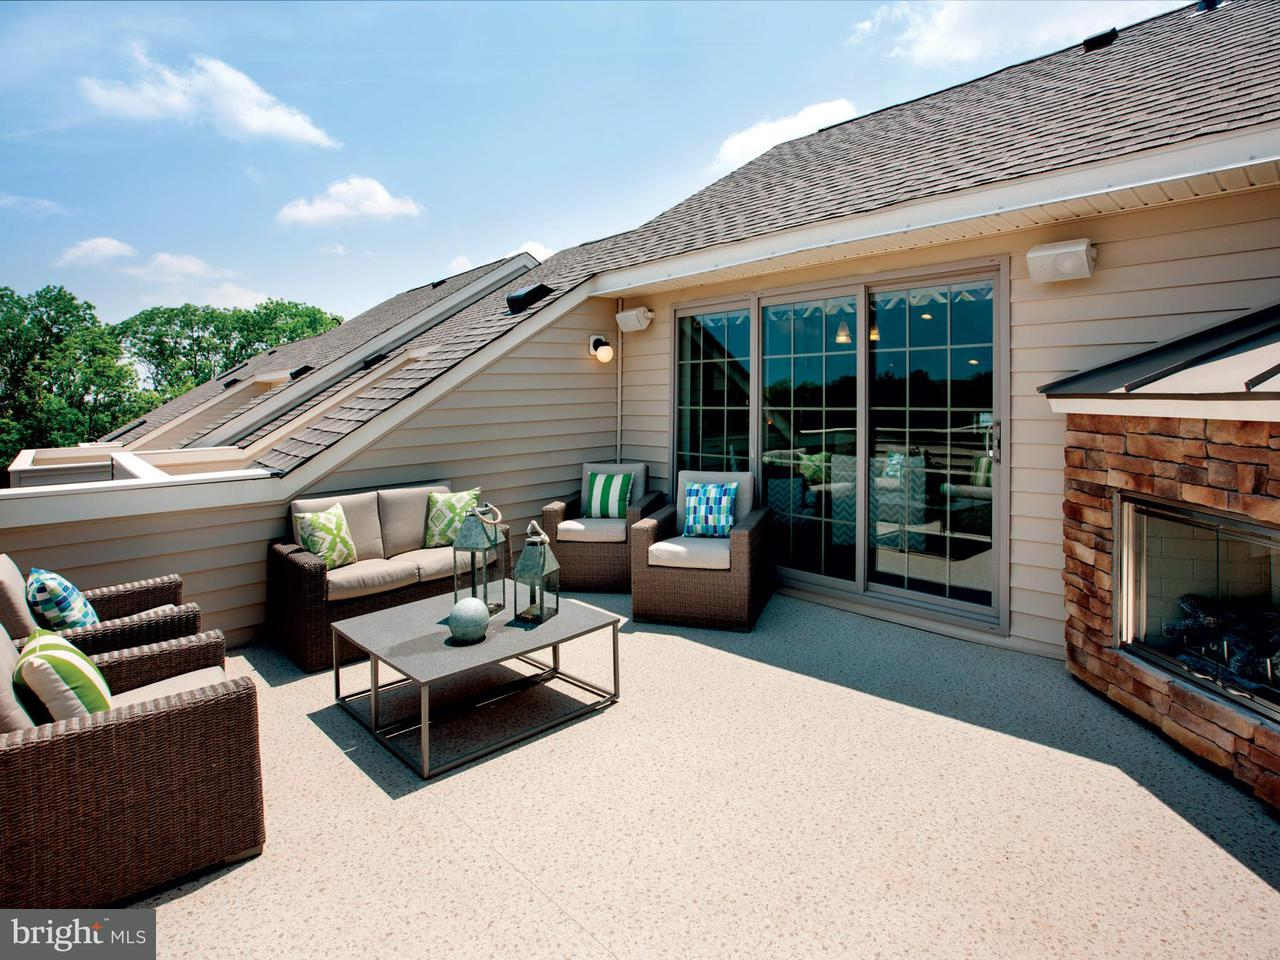 Additional photo for property listing at 22639 NORWALK SQ 22639 NORWALK SQ Ashburn, Virginia 20148 Estados Unidos